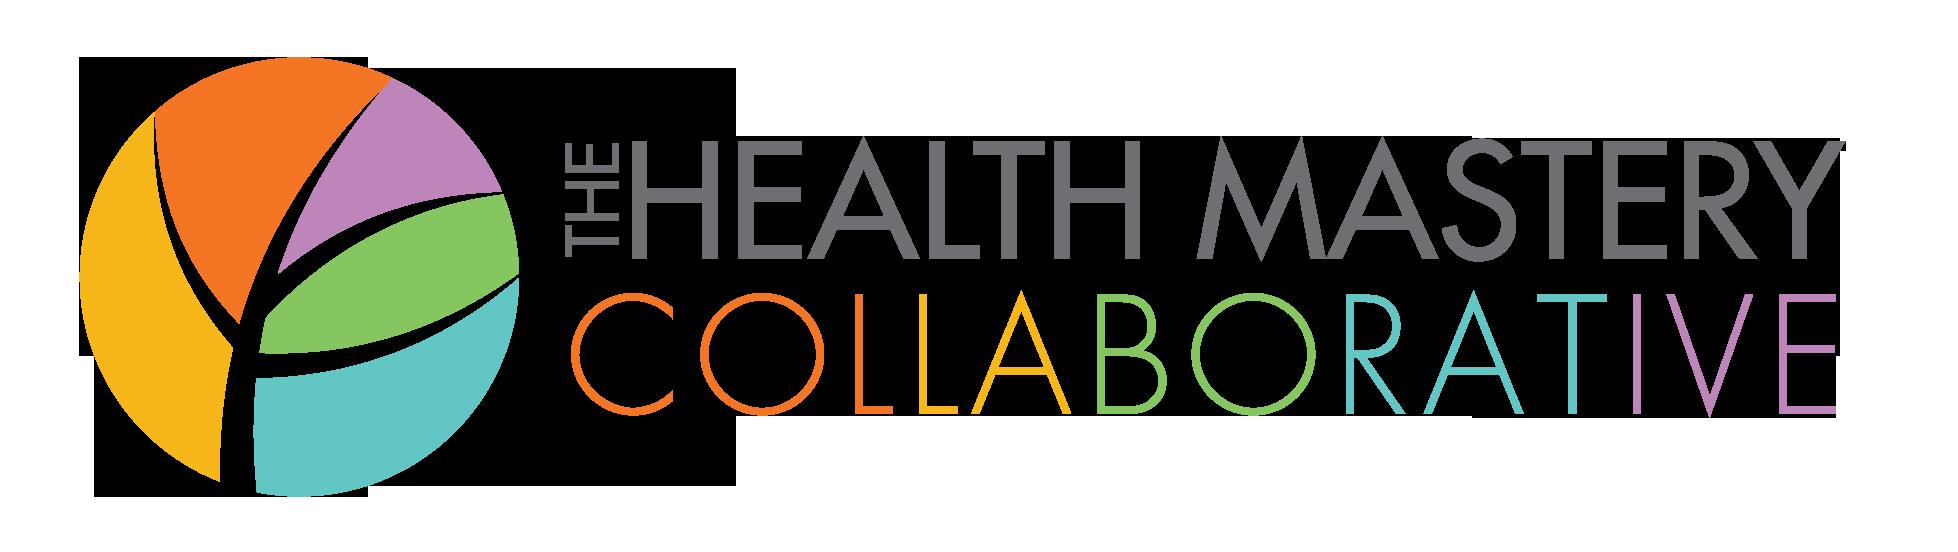 The Health Mastery Collaborative